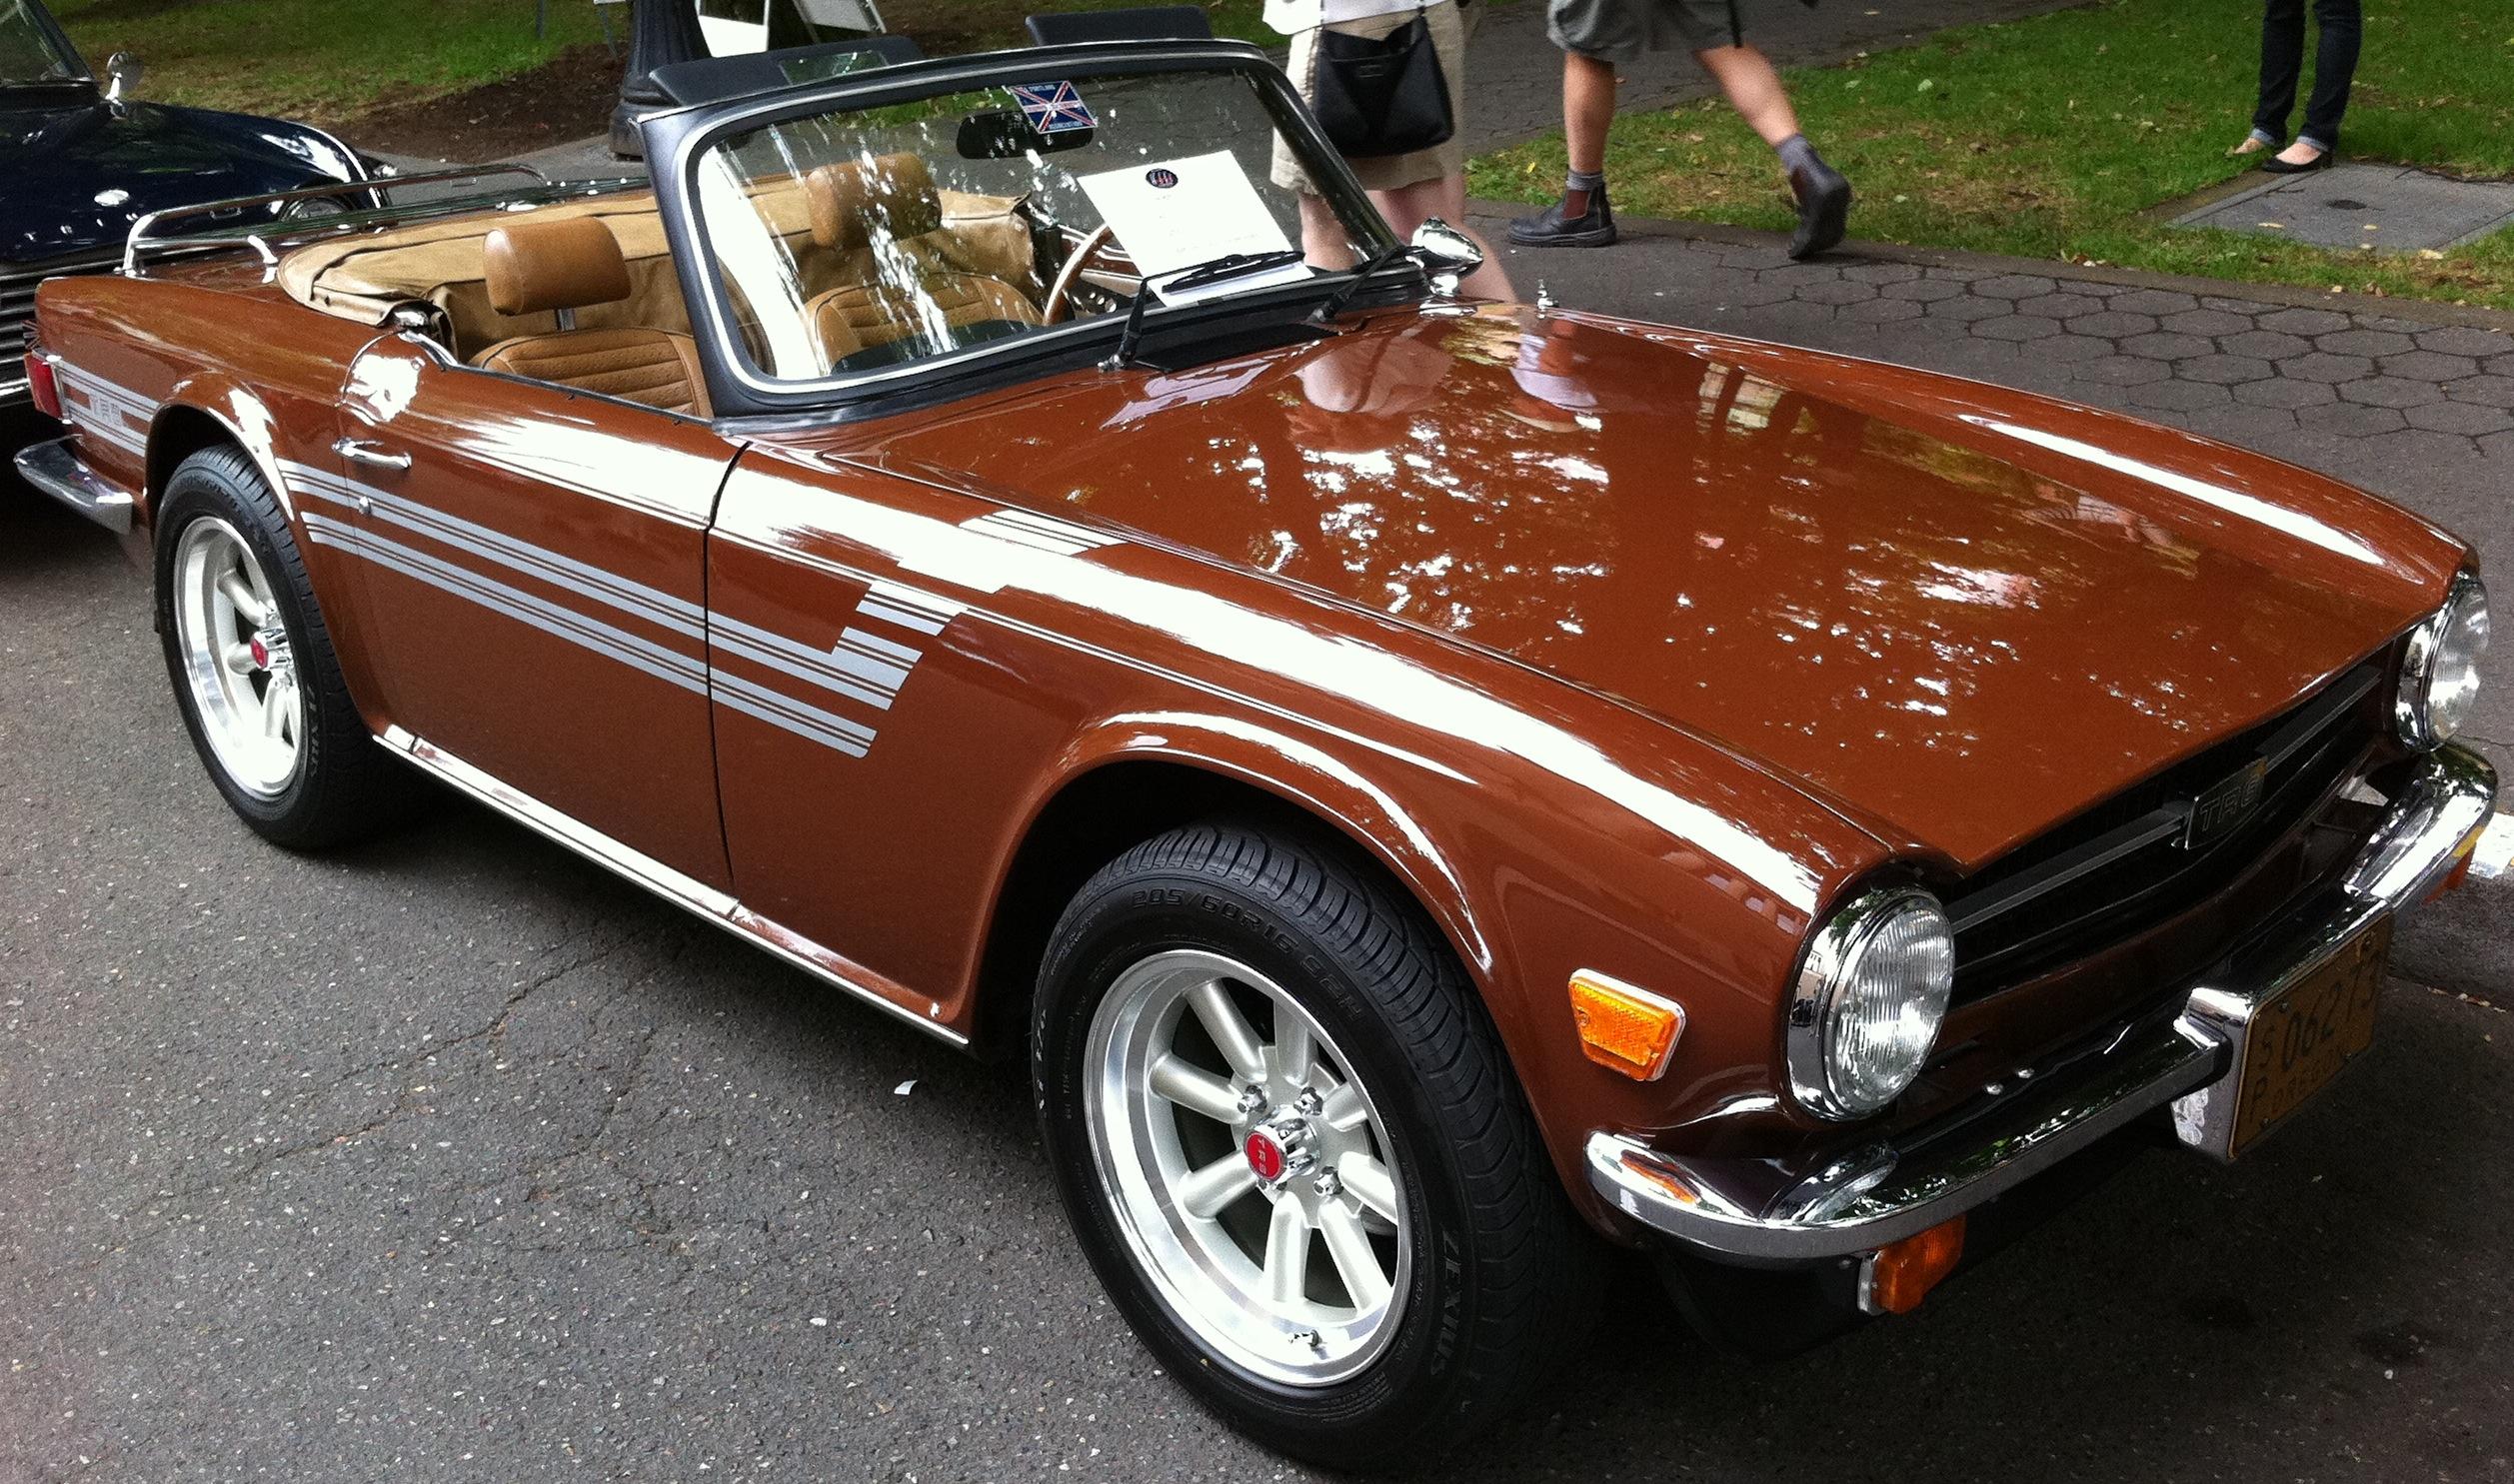 1976-triumph-tr6-brown.jpg 2,515×1,485 pixels | Memories ...